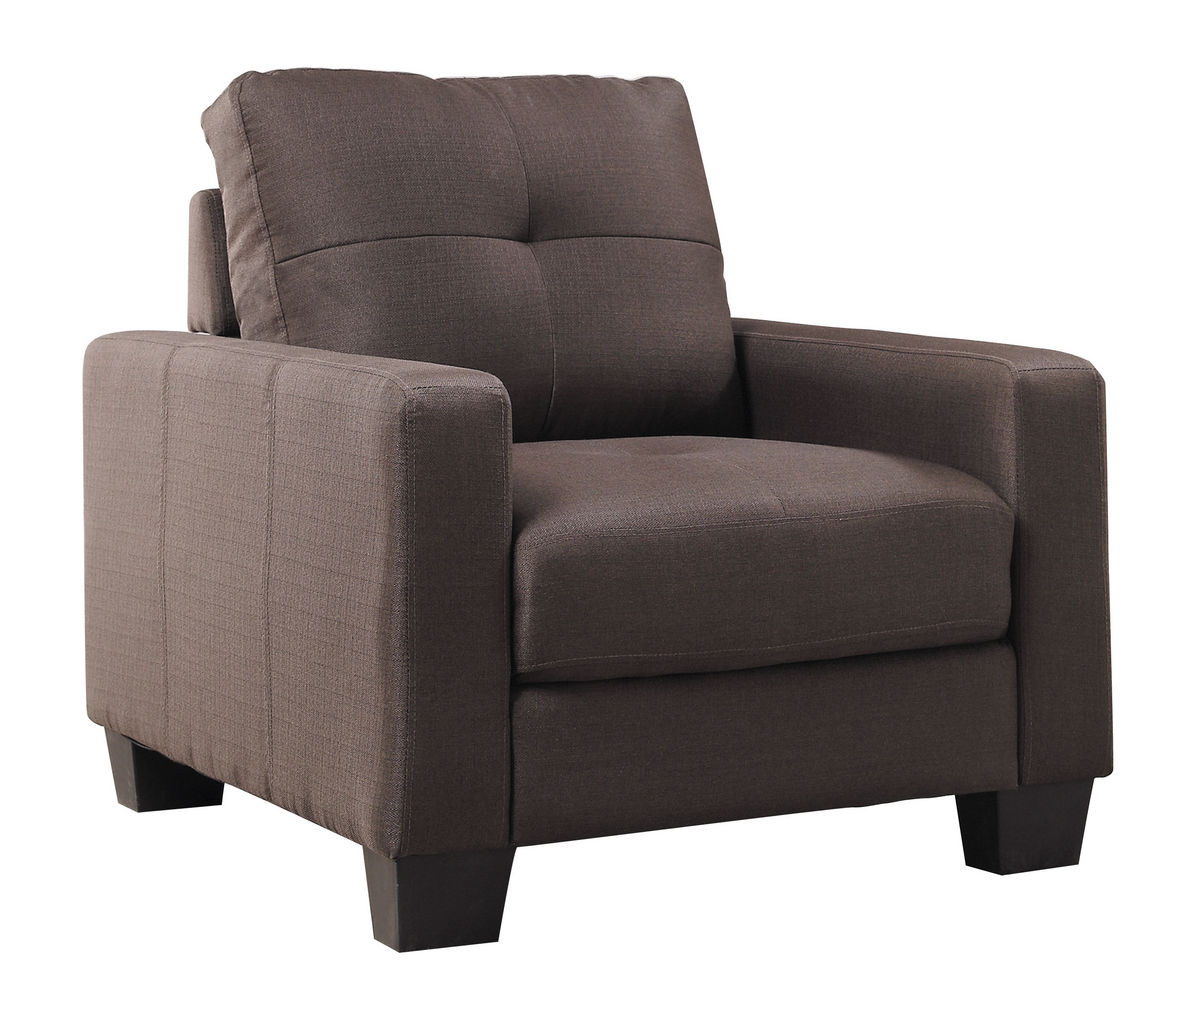 Ramsey Chair Grey Image